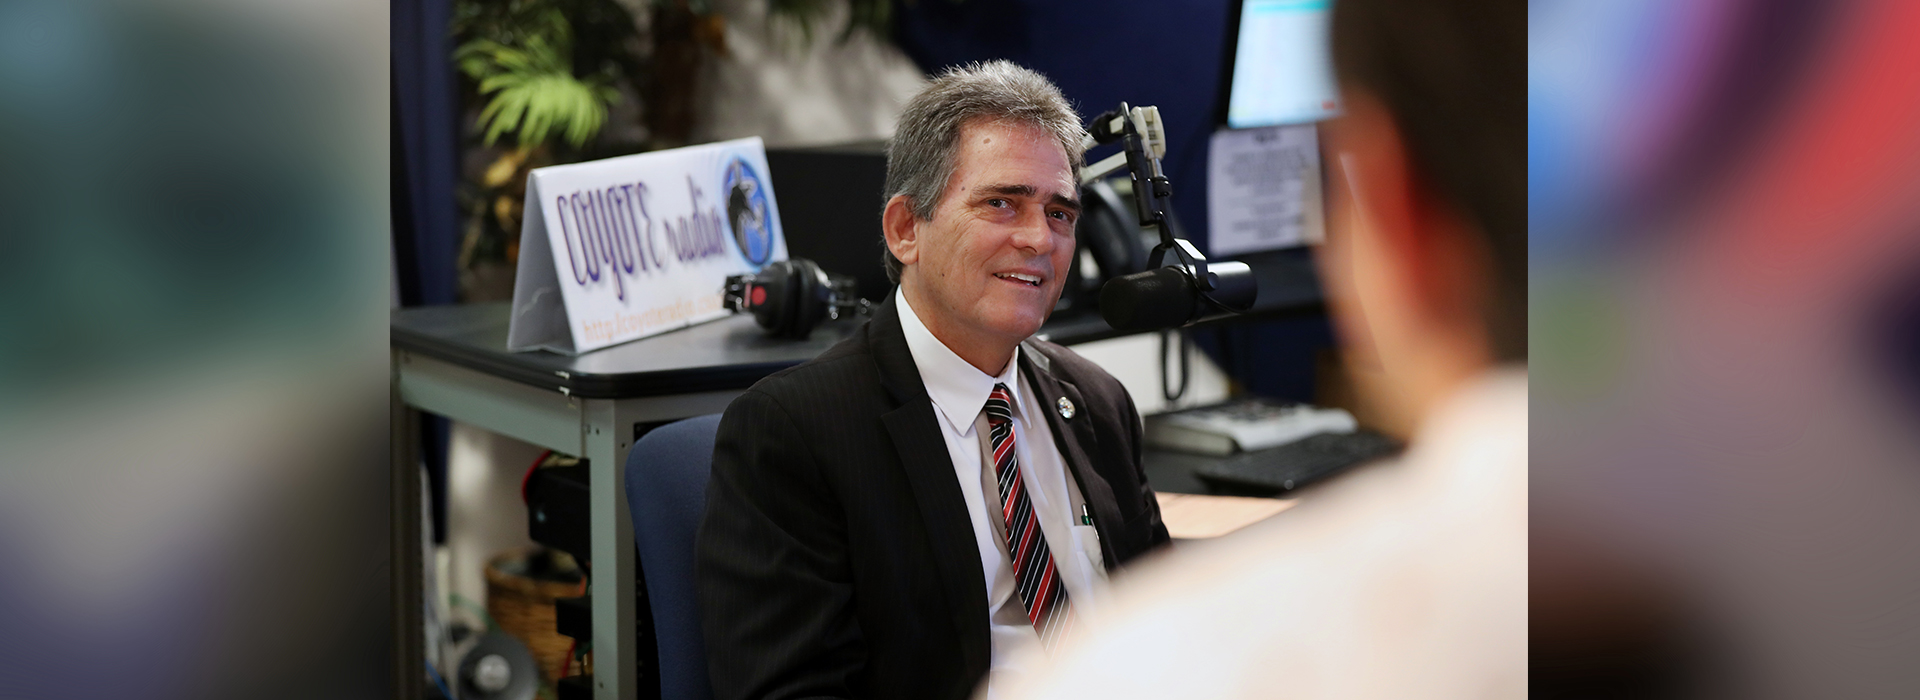 CSUSB hosts 'Meet the Mayor @CSUSB' town hall on Oct. 26